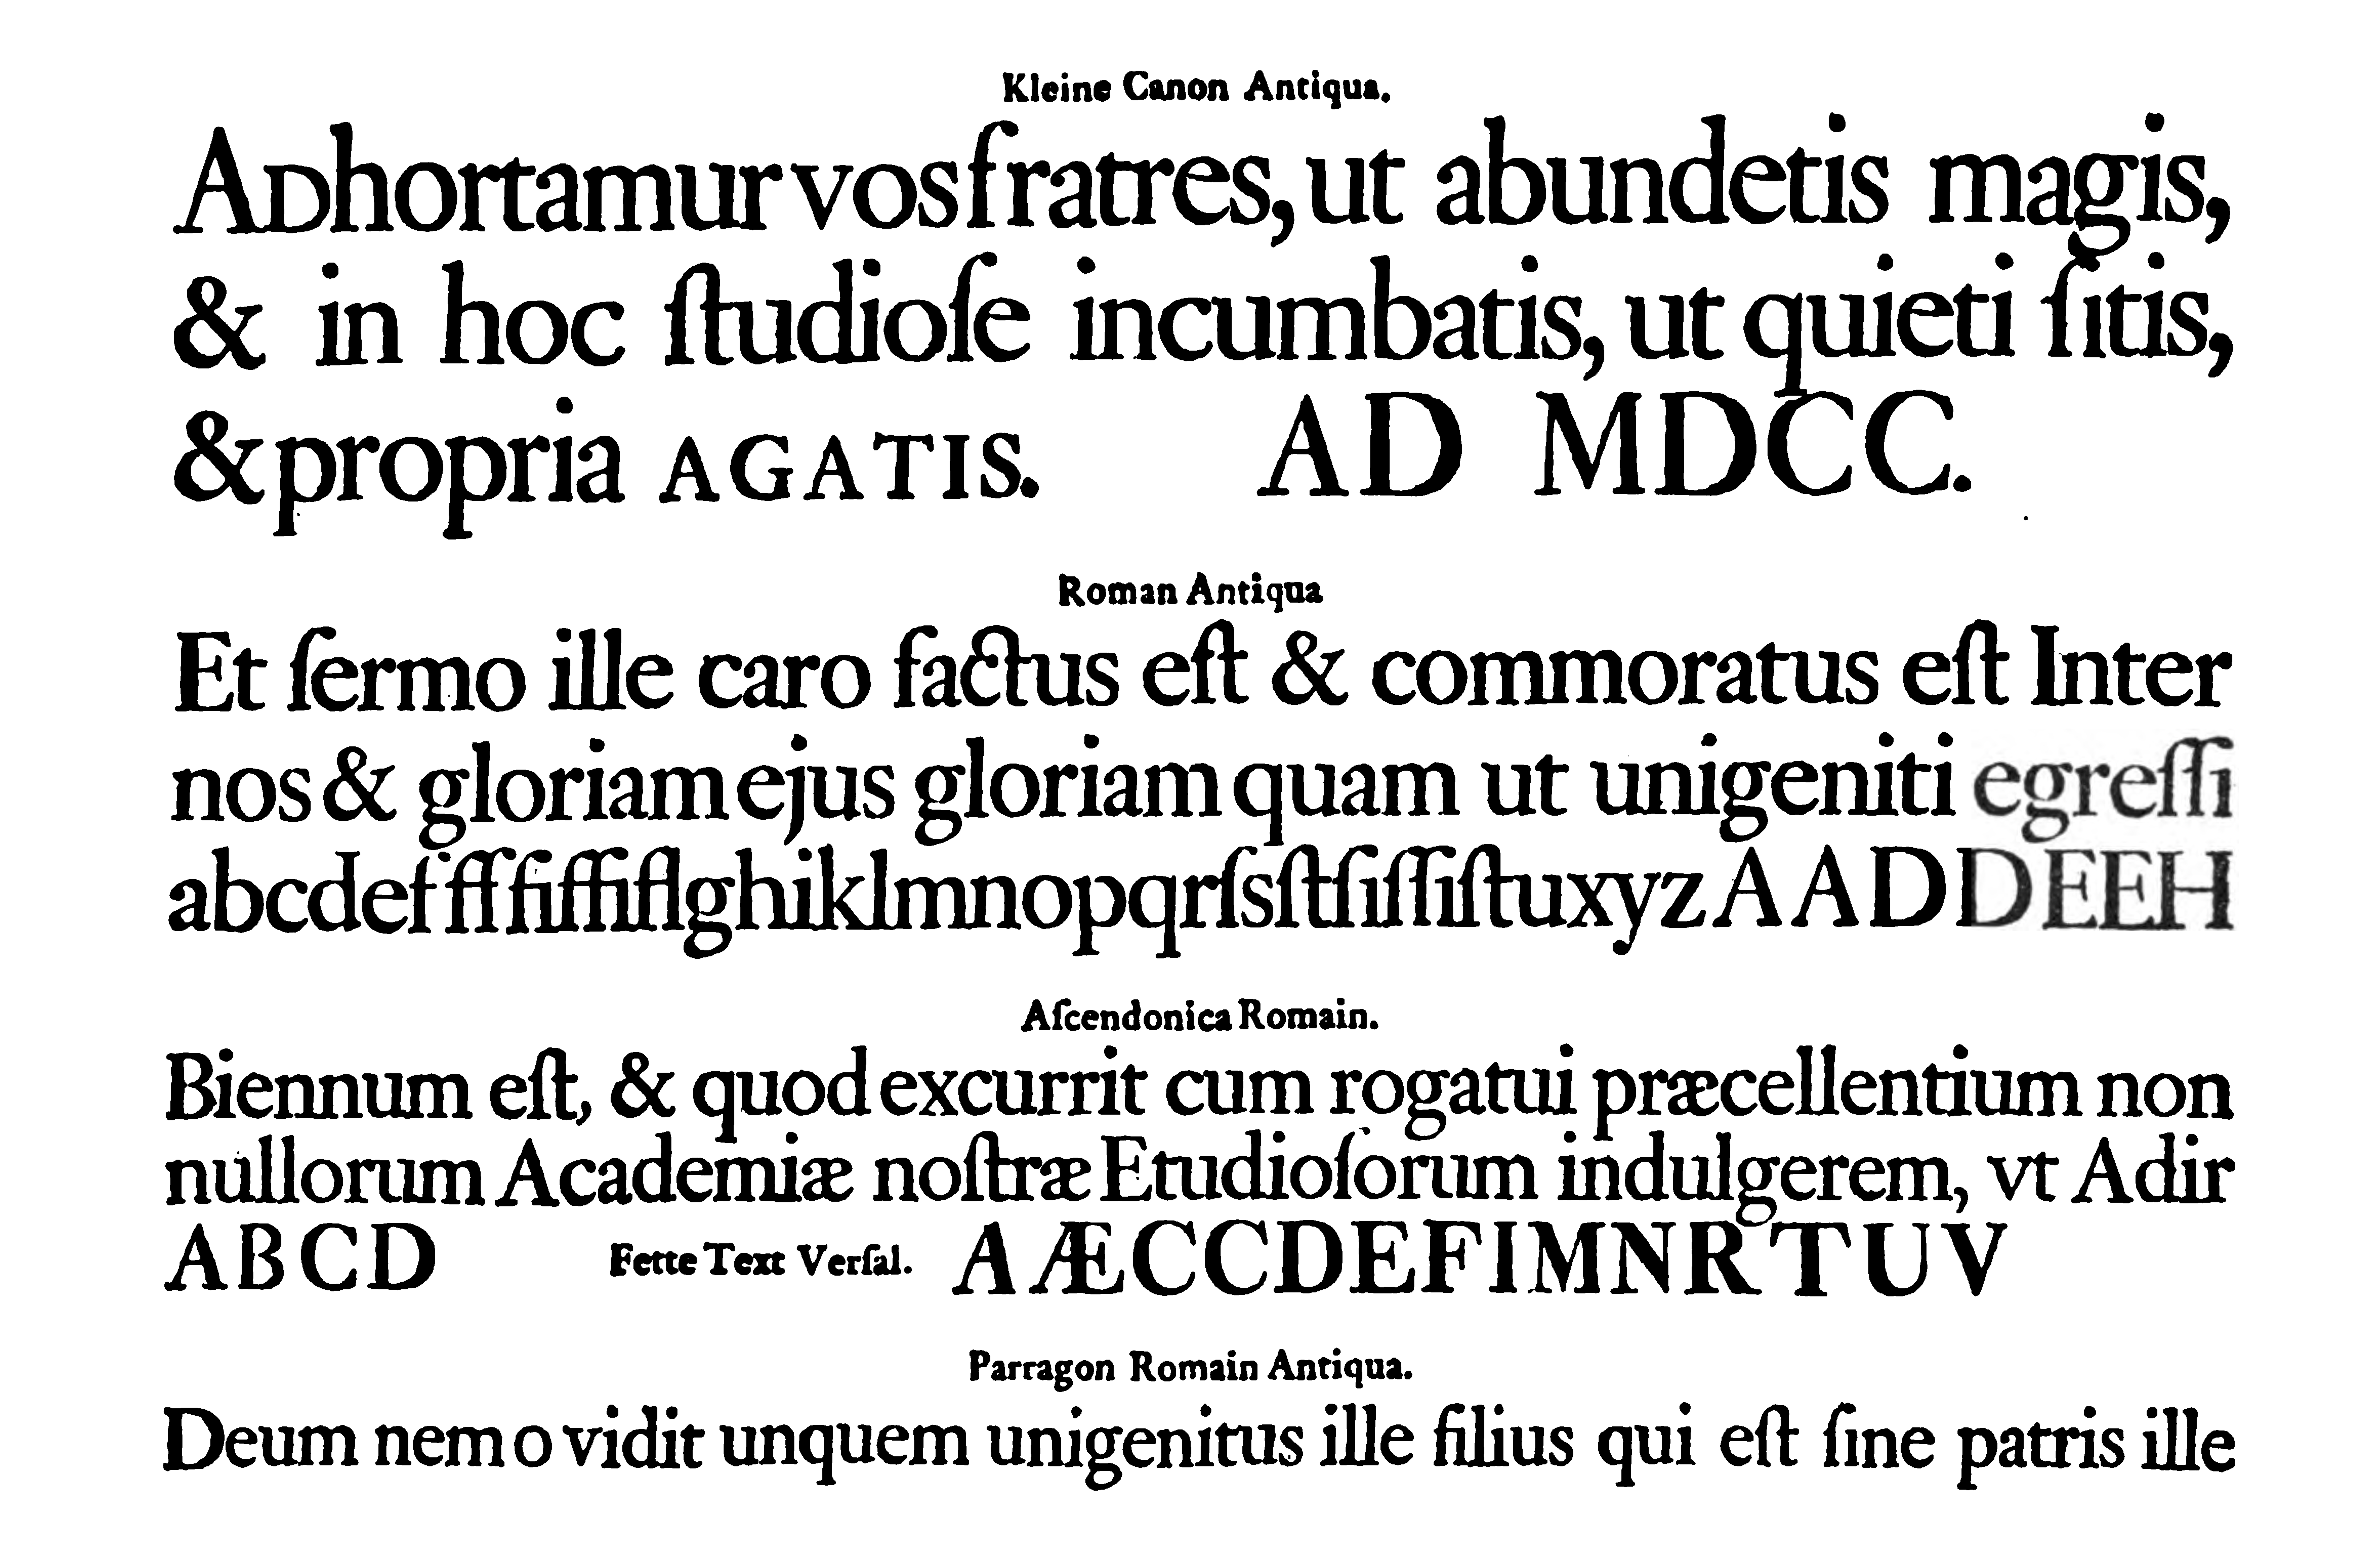 Ehrhardt_specimen.png (7515×4870)